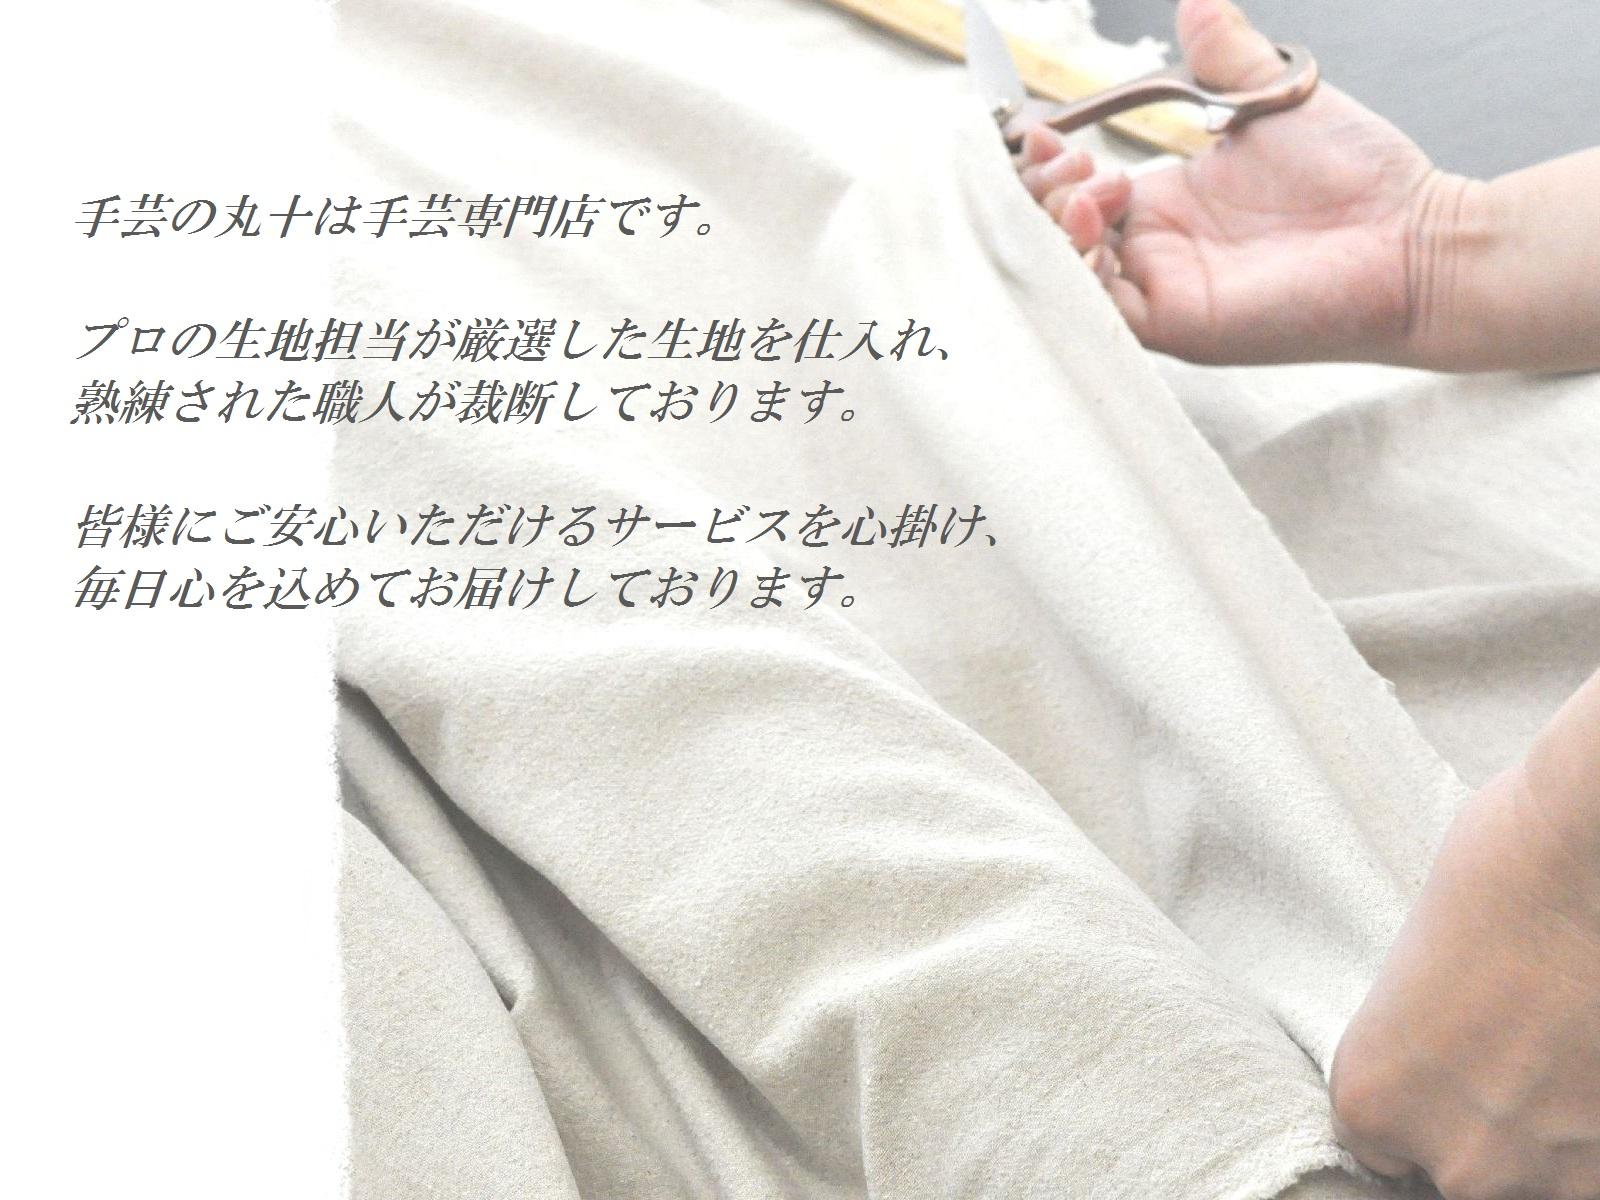 Sen ritsu ☆ naniIRO textile 2014 ☆ / 1 m units Ito shobi's natural world nice ♪ optimal design cotton scarf, clothing, baby / fabric / dress / tunic / baby clothing and children clothing / bedding / bag / natural / cotton / cotton double gauze cotton Lad